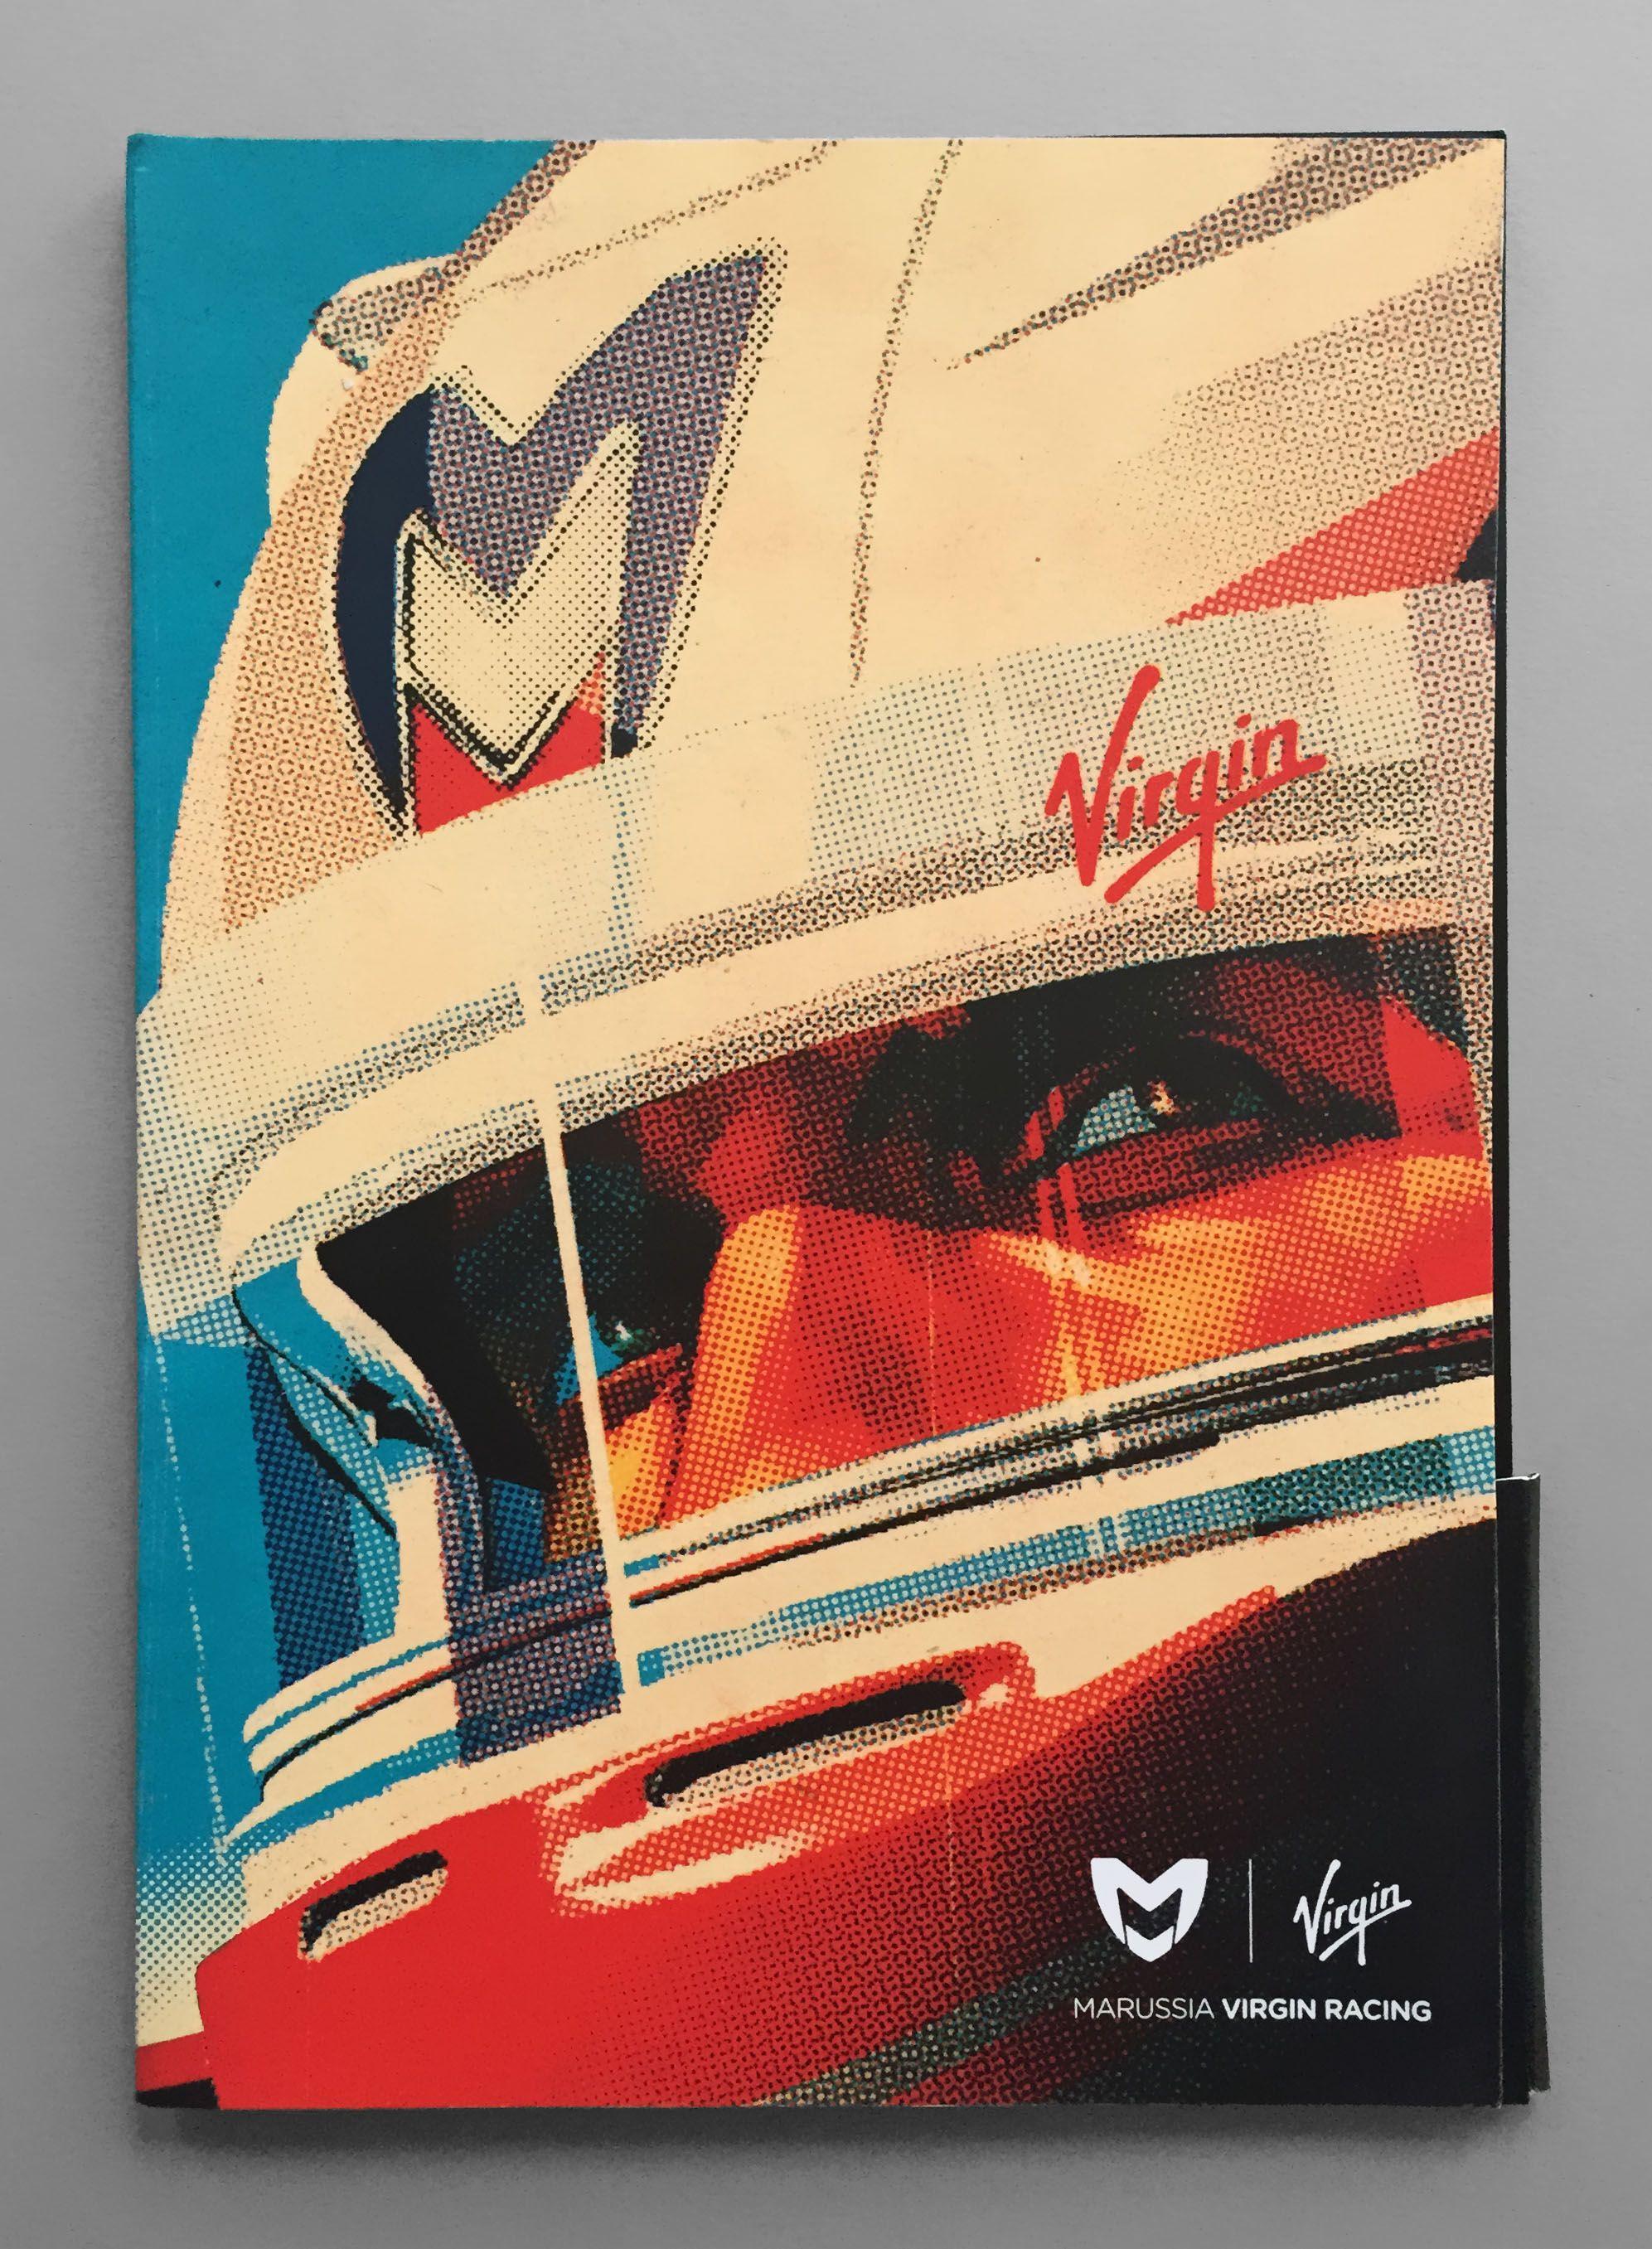 Press Pack For Virgin Marussia F1 Team Artwork By Tavis Coburn Www Dutchuncle Co Uk Tavis Coburn